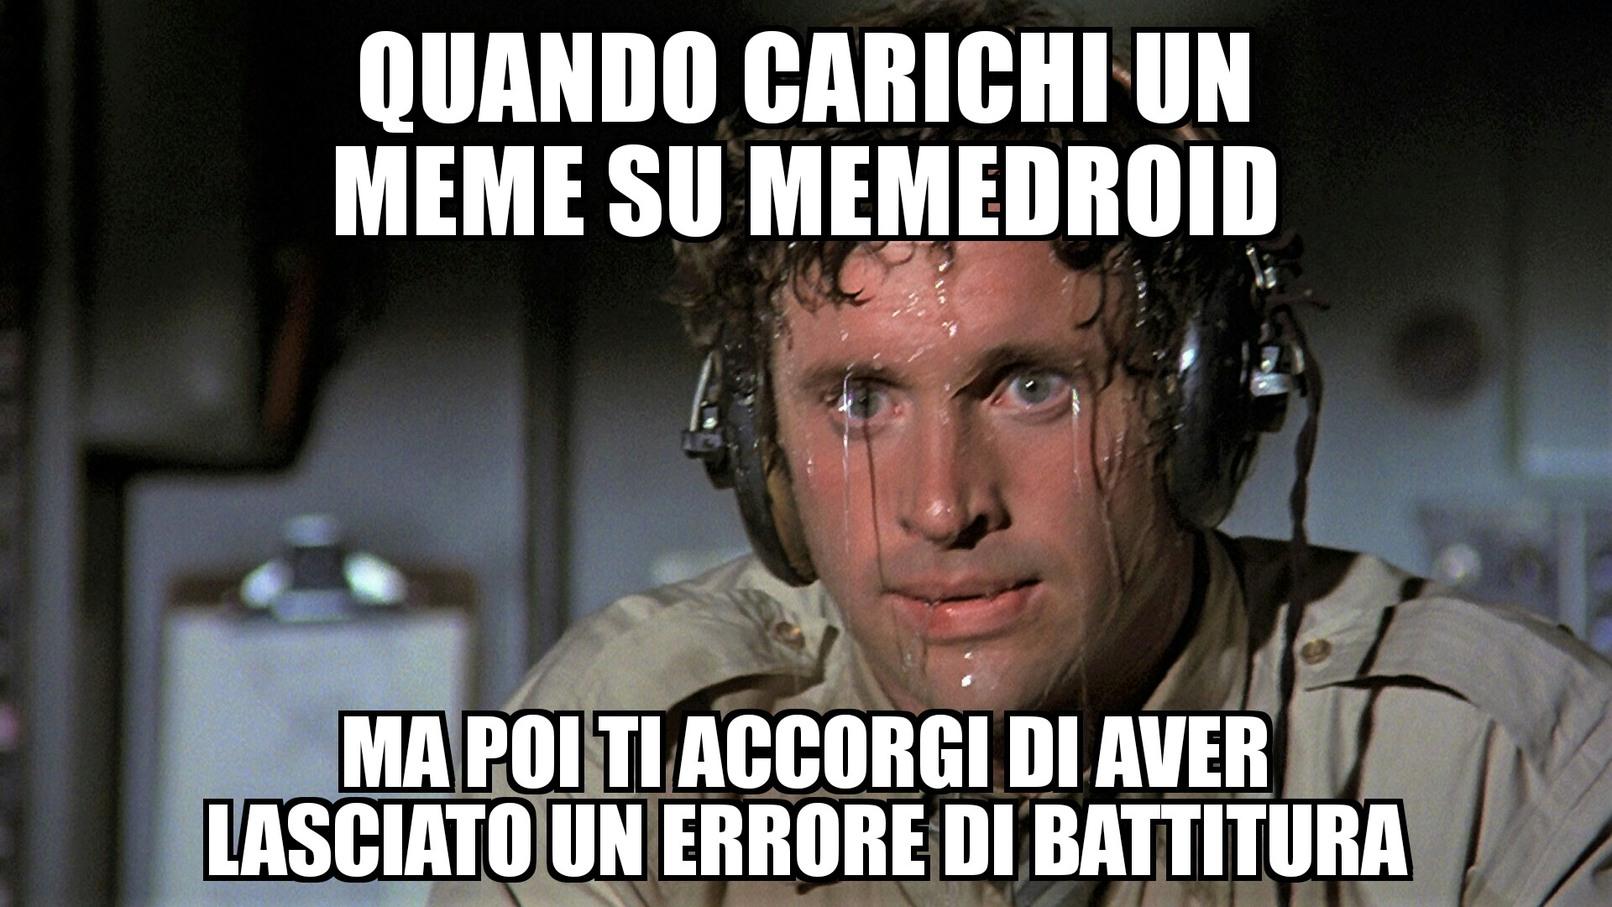 Errore di battitura - meme